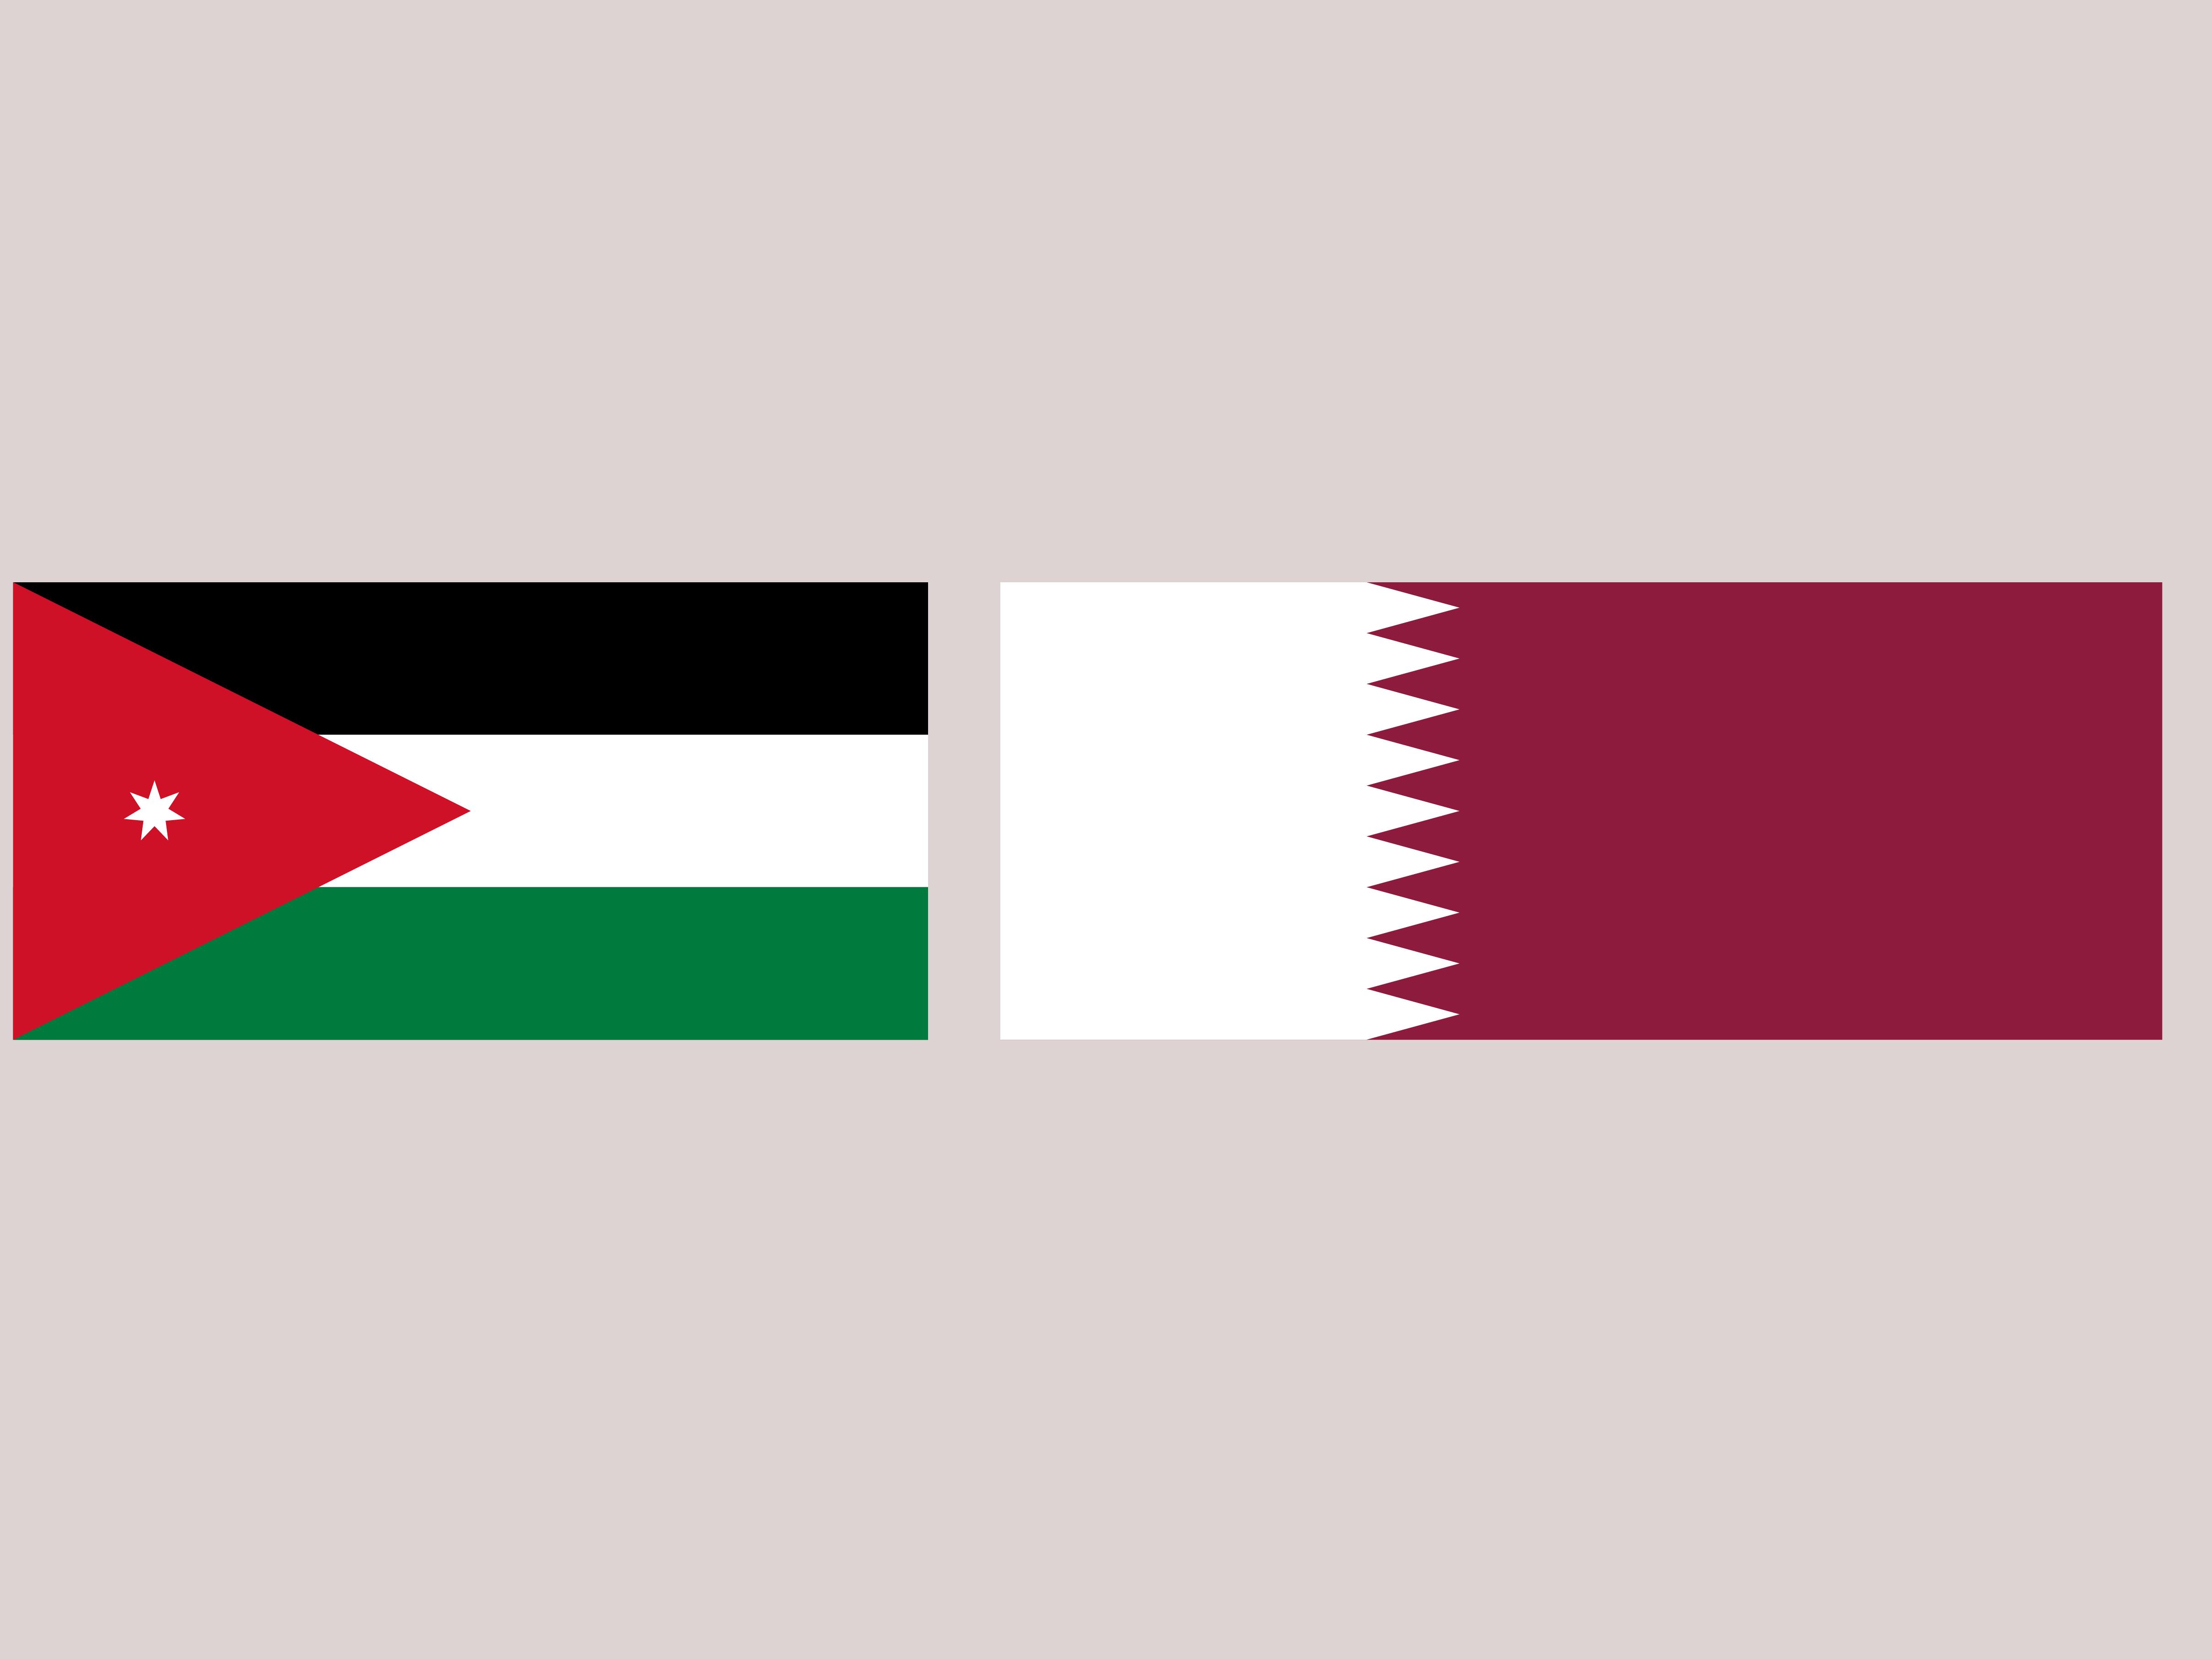 Jordan appoints ambassador to Qatar